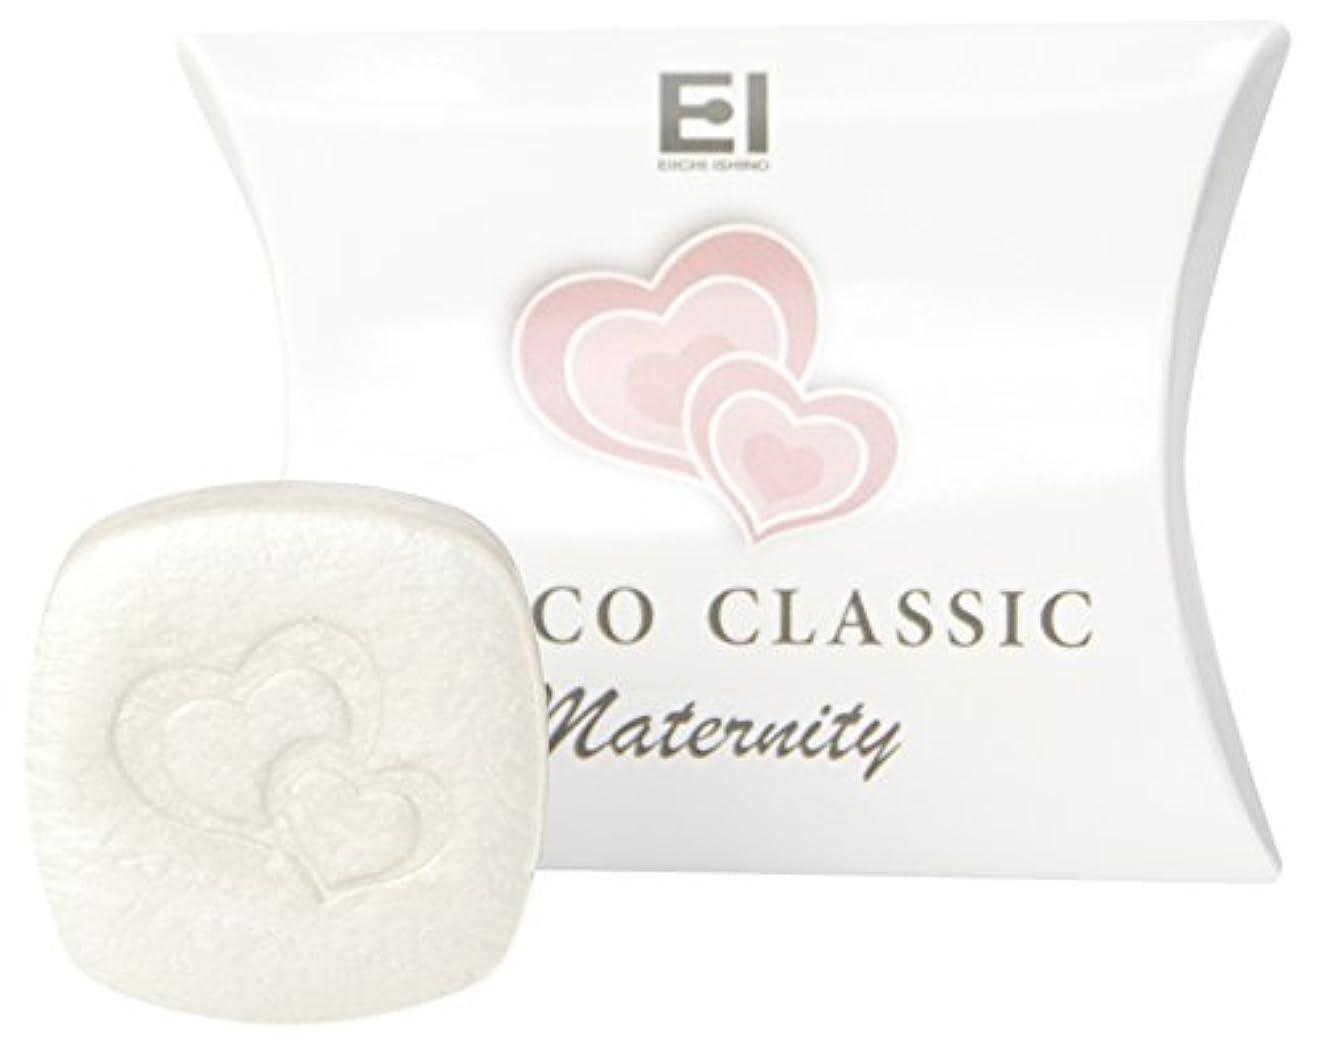 四面体一般用語集EI JUNCO CLASSIC MATERNITY SOAP 20g